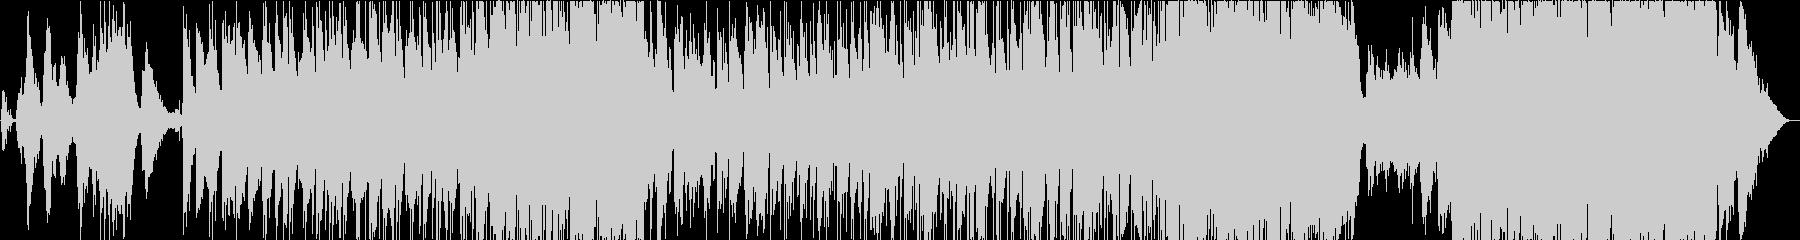 Briseの未再生の波形